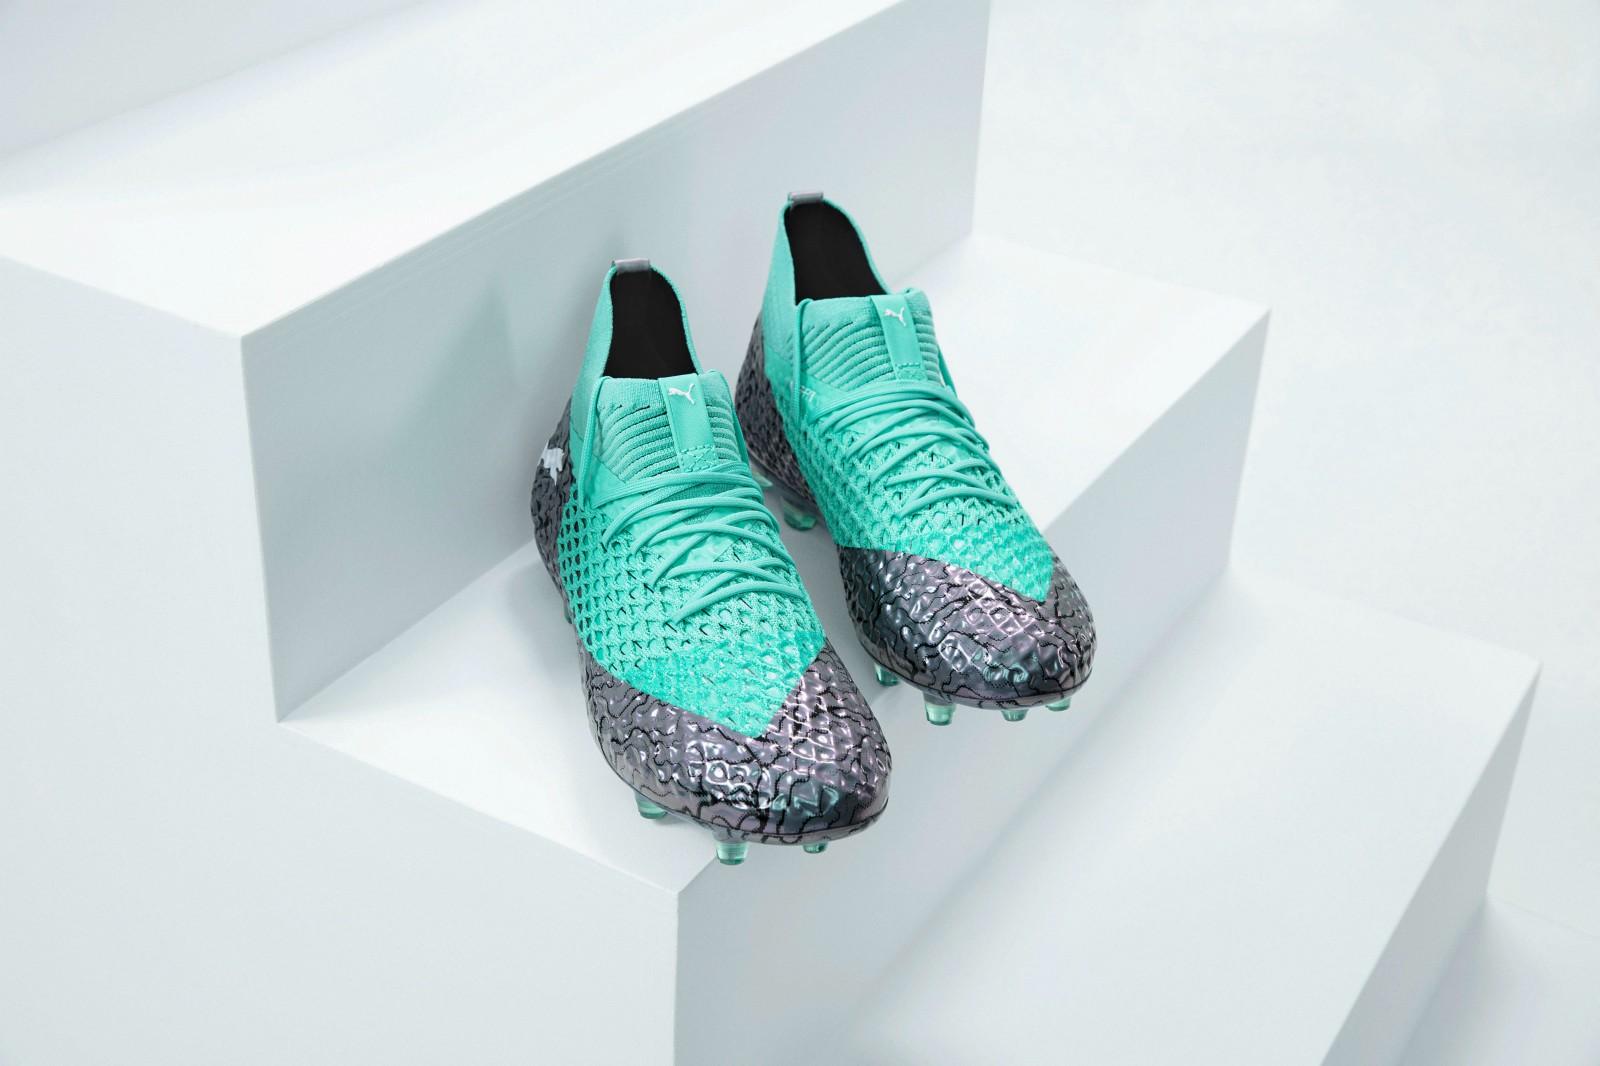 Mundial de Rusia 2018 Conoce los Zapatos Puma Illuminate Pack